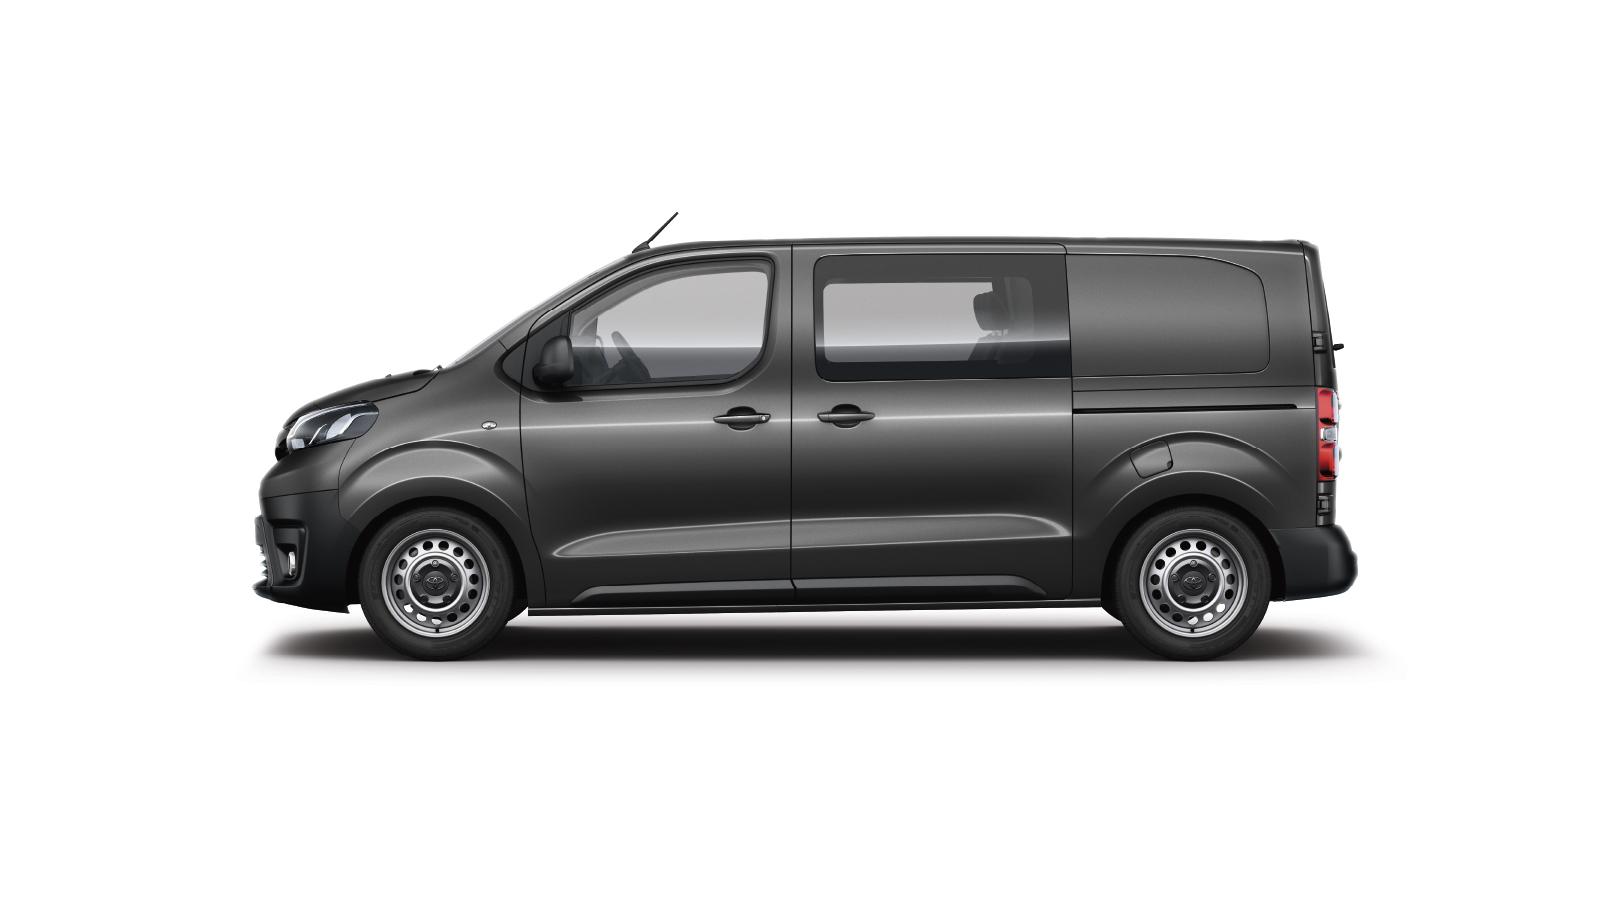 Kelebihan Toyota Pro Ace Spesifikasi